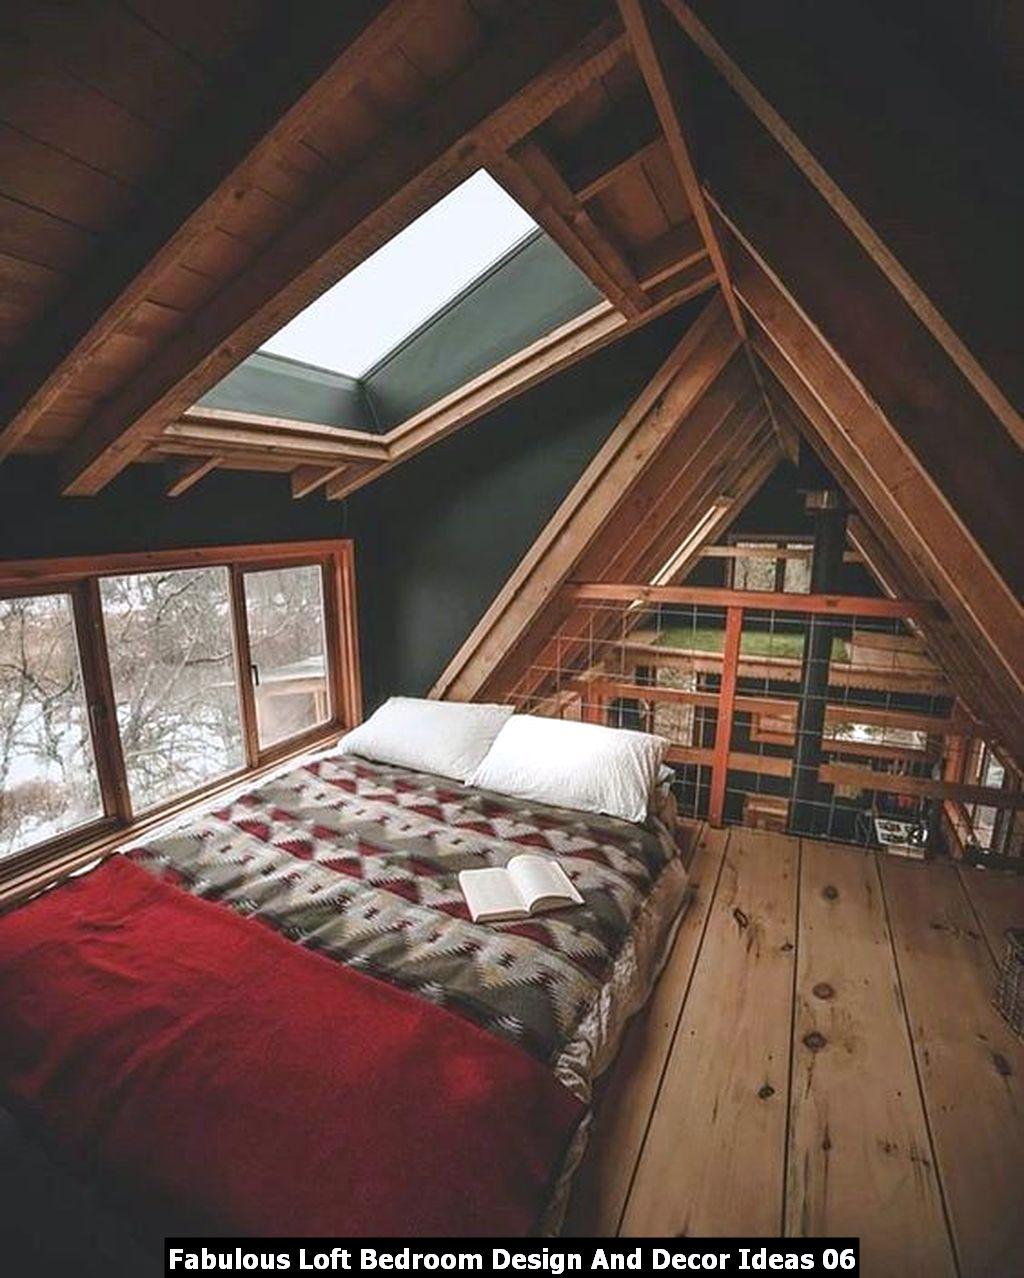 Fabulous Loft Bedroom Design And Decor Ideas 06